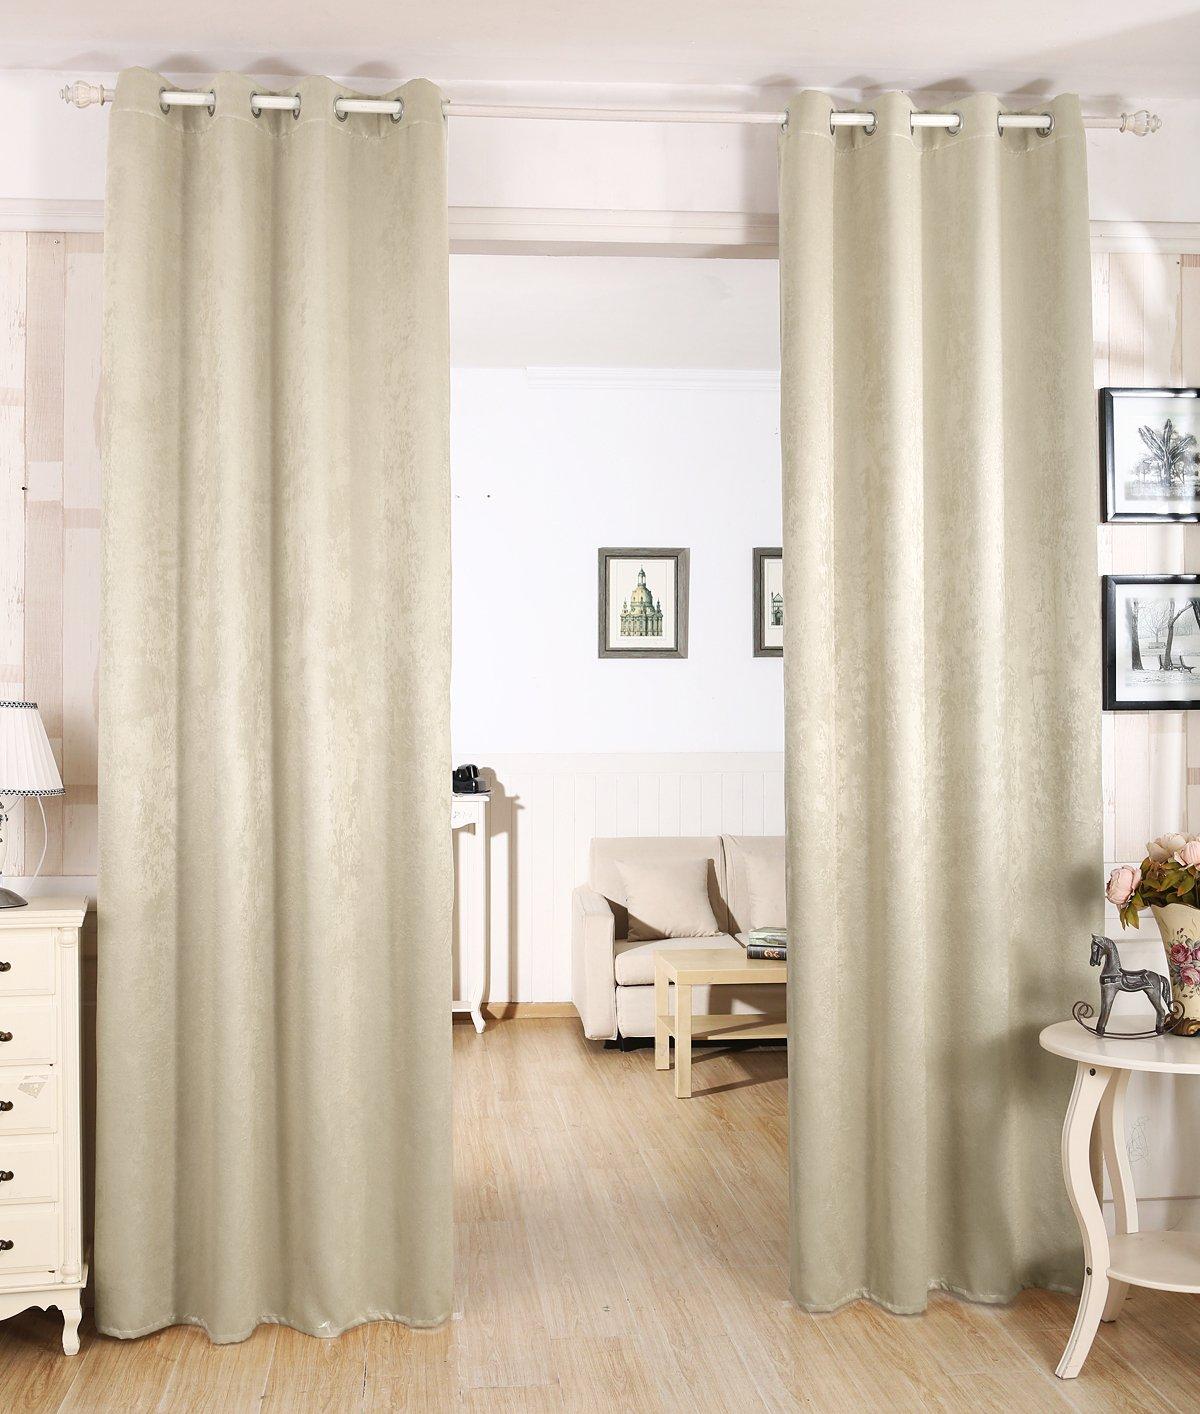 raumtrenner vorhang blickdicht perfect raumteiler with. Black Bedroom Furniture Sets. Home Design Ideas